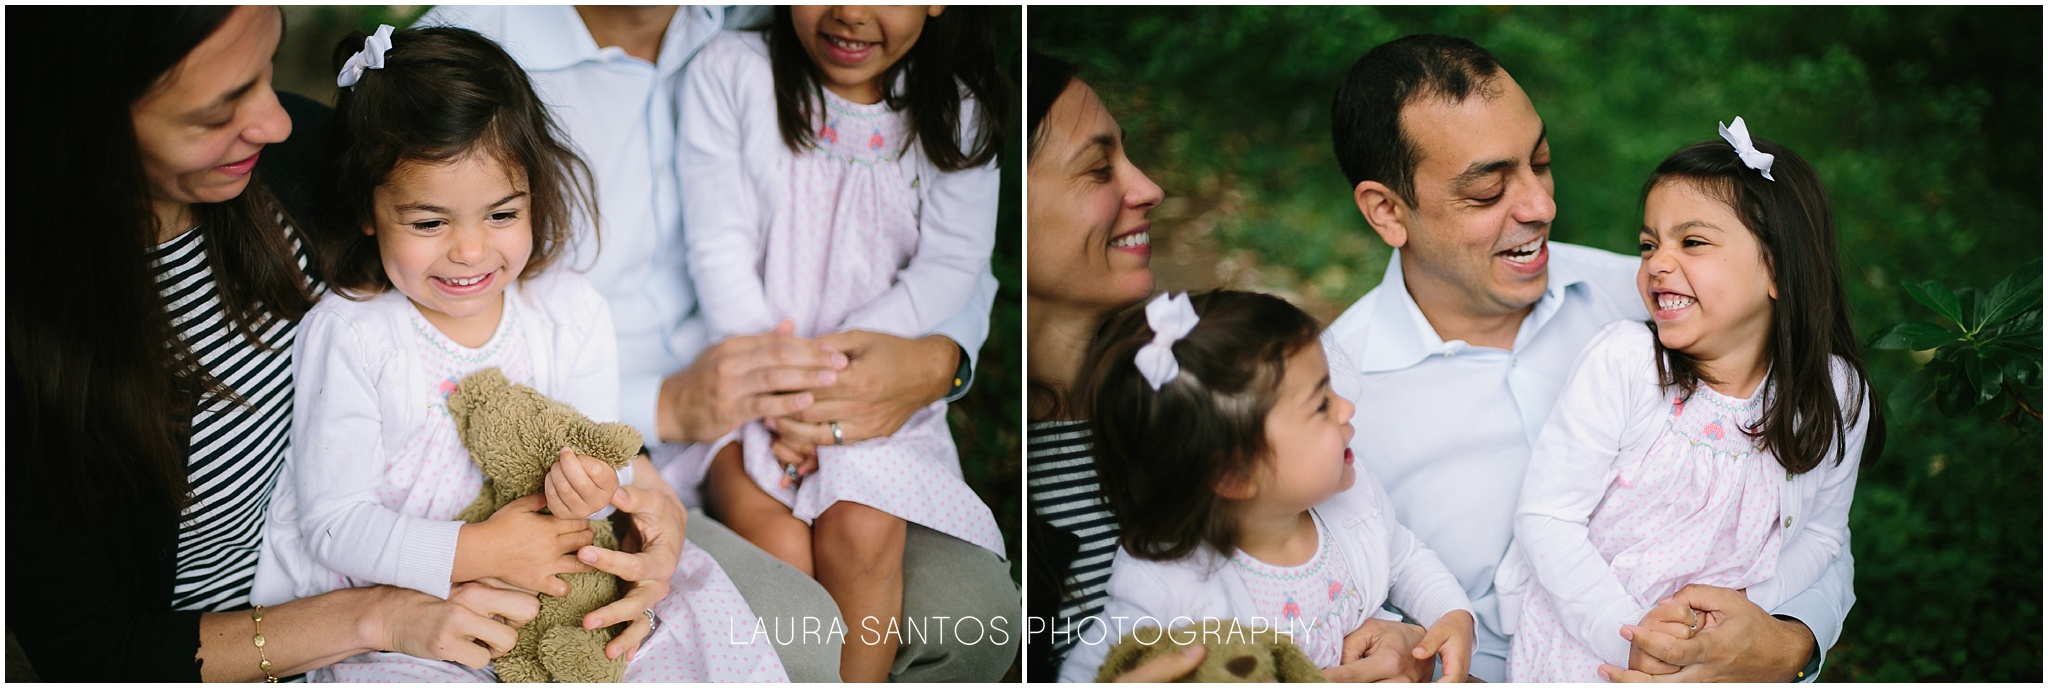 Portland OR Family Photograher Laura Santos Photography_0063.jpg